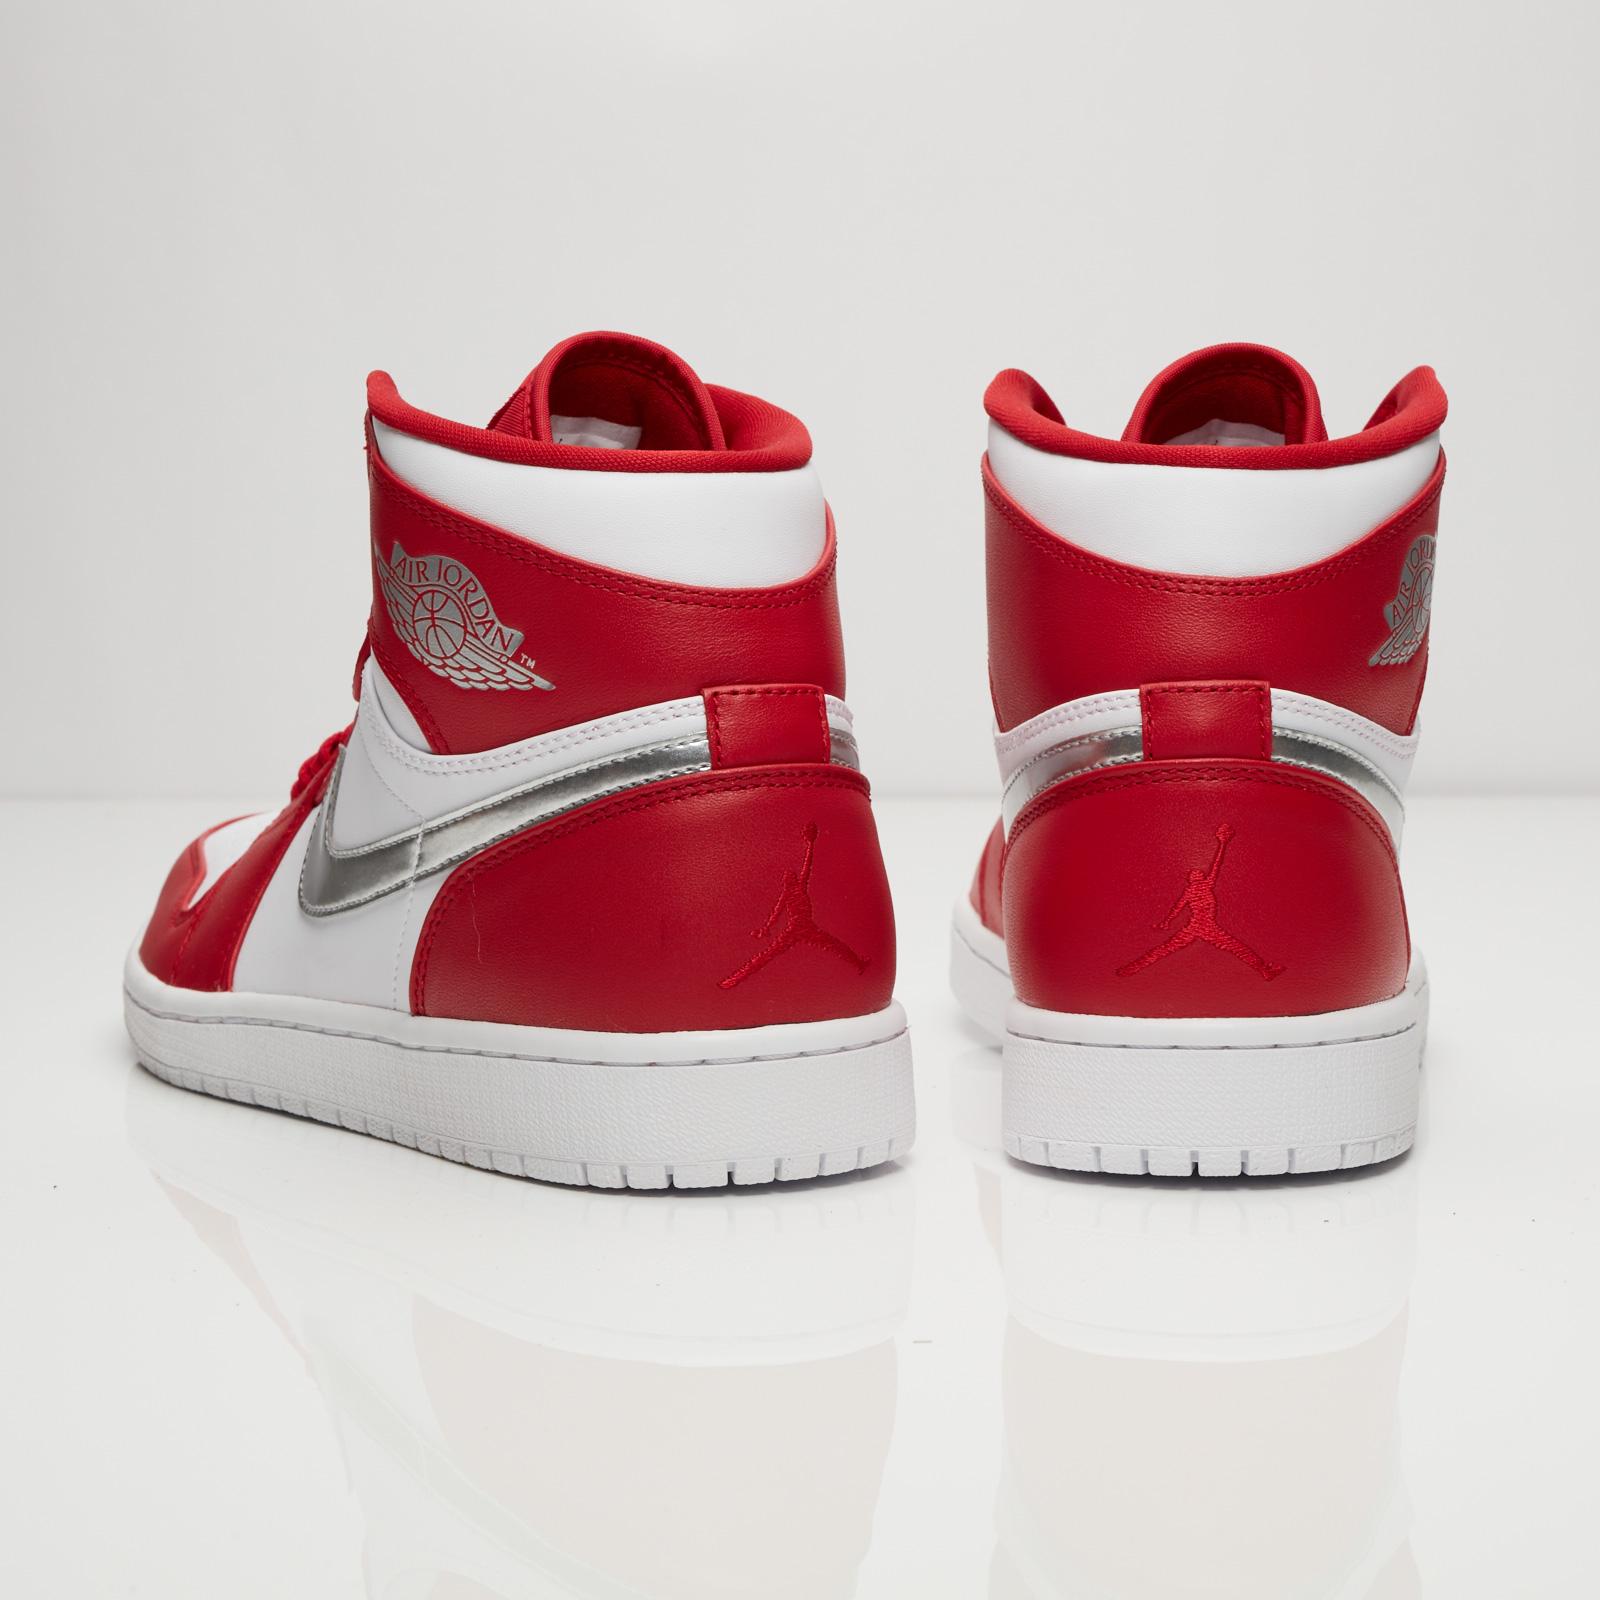 0bc94cb10ceee0 Jordan Brand Air Jordan 1 Retro High - 332550-602 - Sneakersnstuff ...